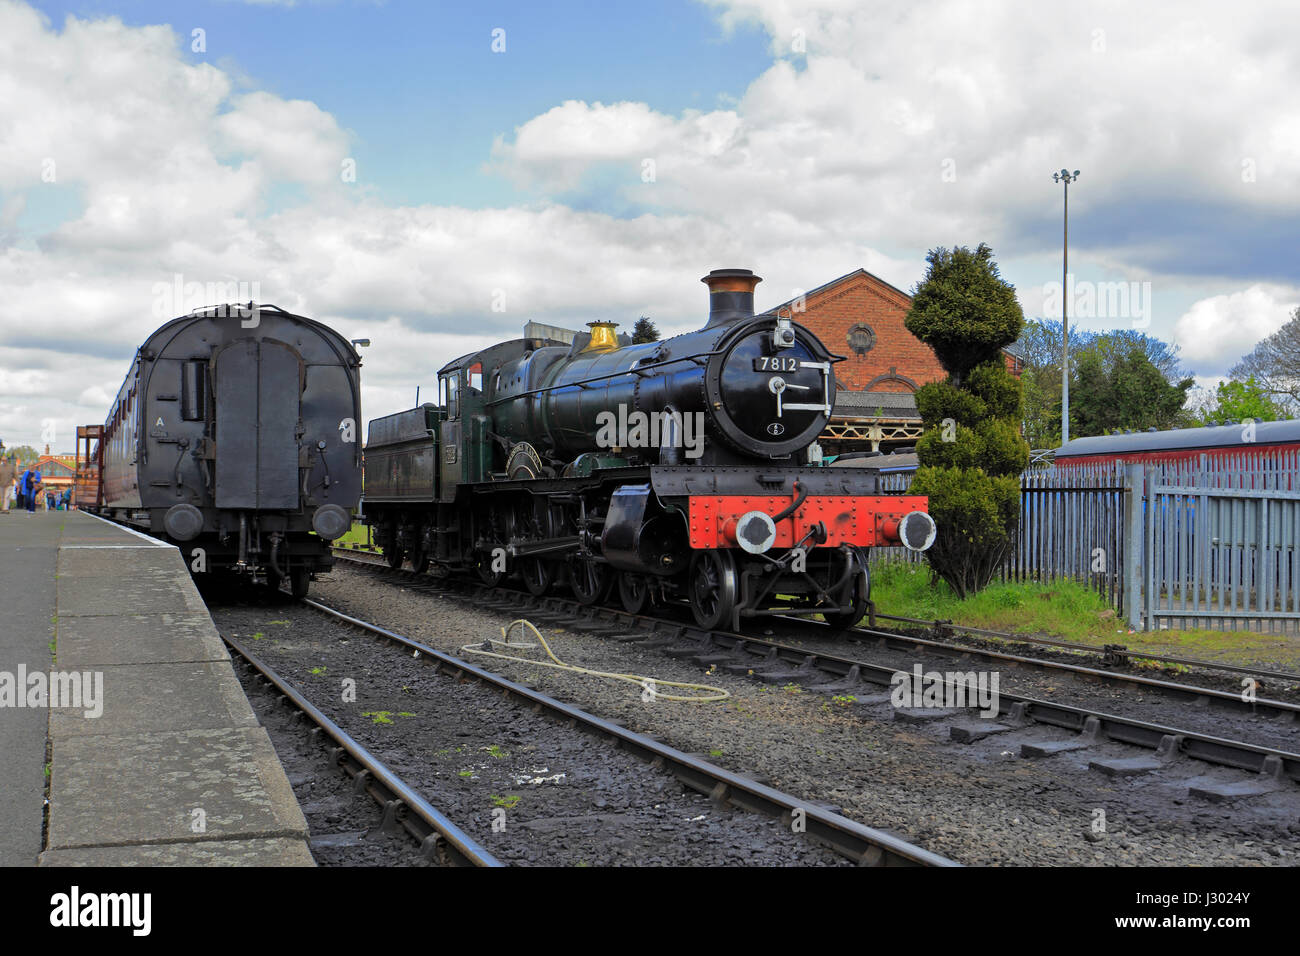 Steam locomotive No. 7812 at Kidderminster Railway Station on the Severn Valley Railway, Kidderminster, Shropshire, - Stock Image